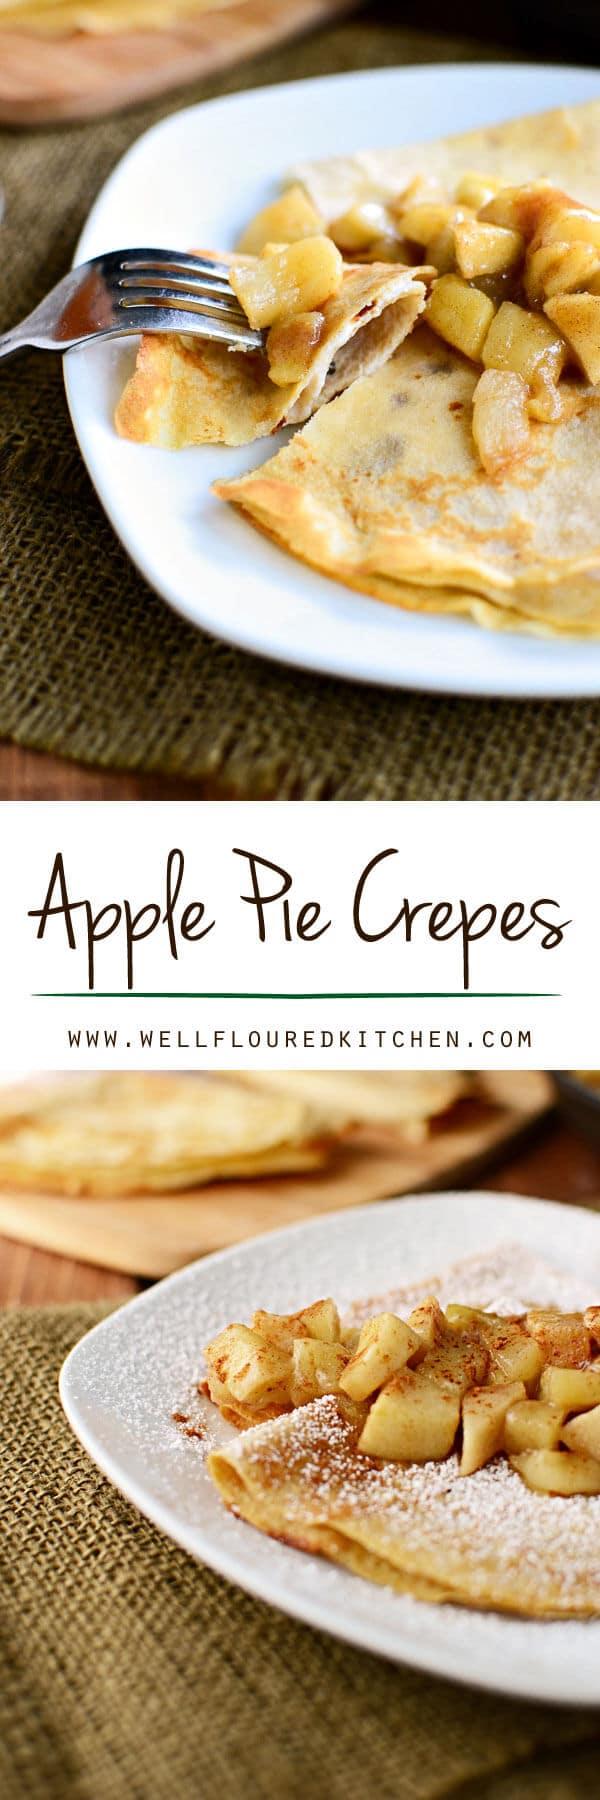 Easy whole wheat apple pie recipe